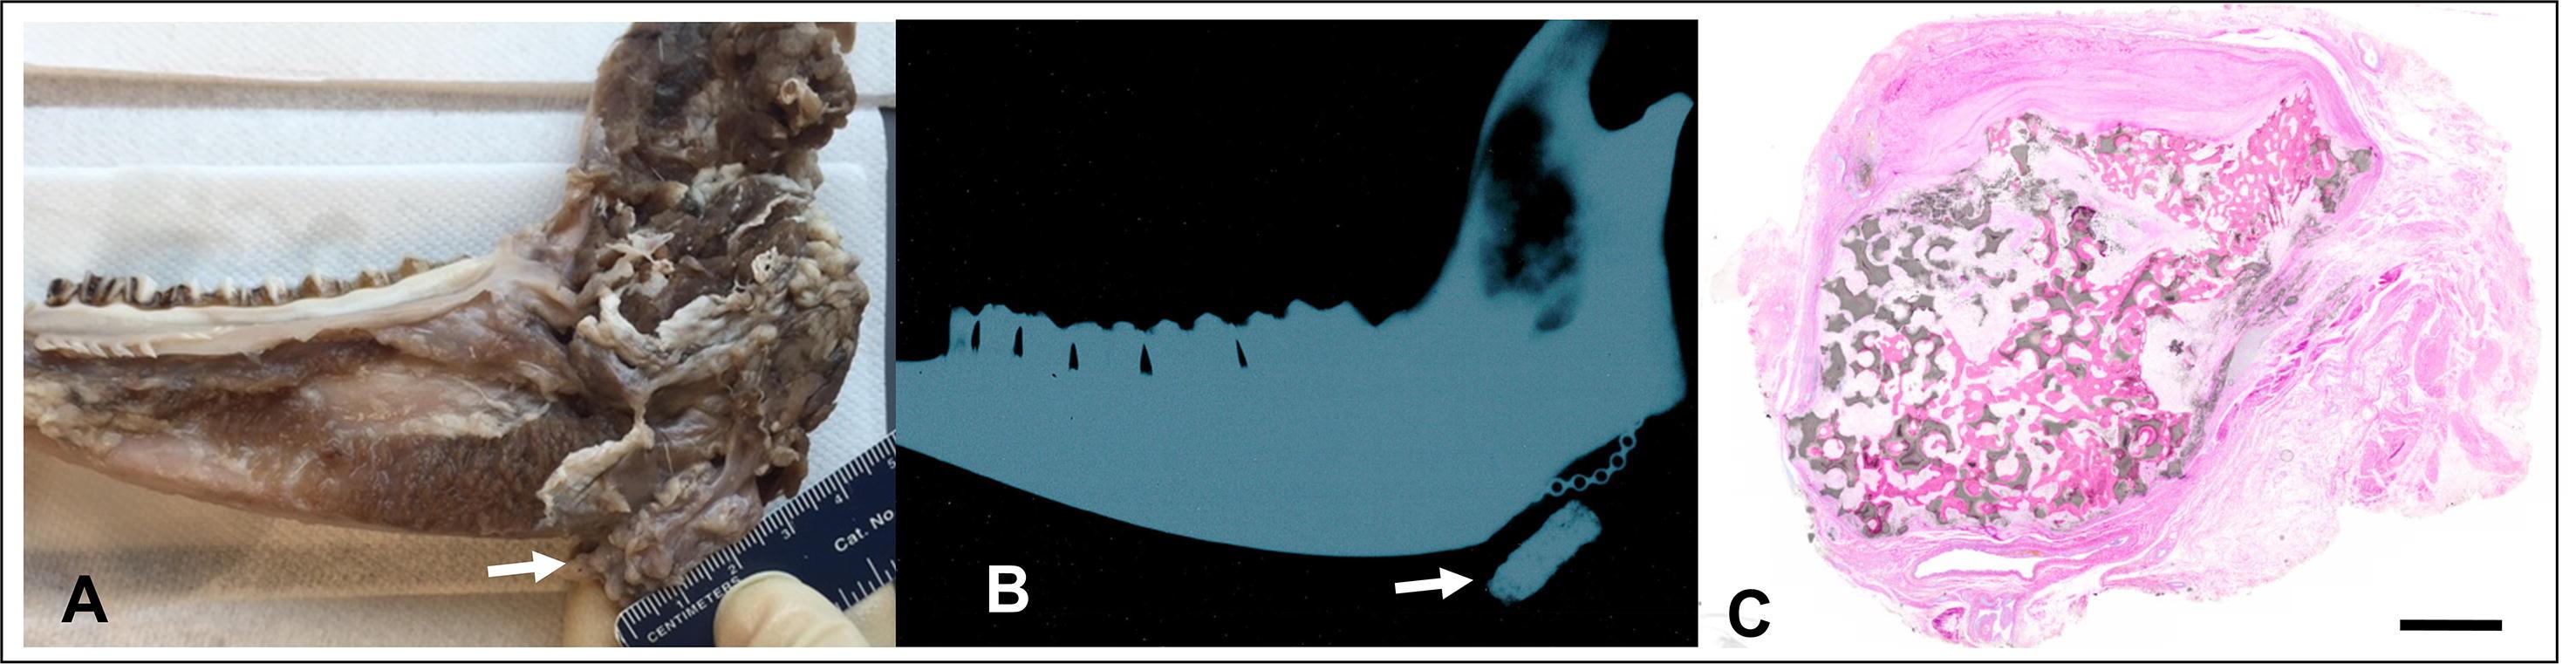 Reconstruction of Large Mandibular Defects Using Autologous Tissues Generated From In Vivo Bioreactors